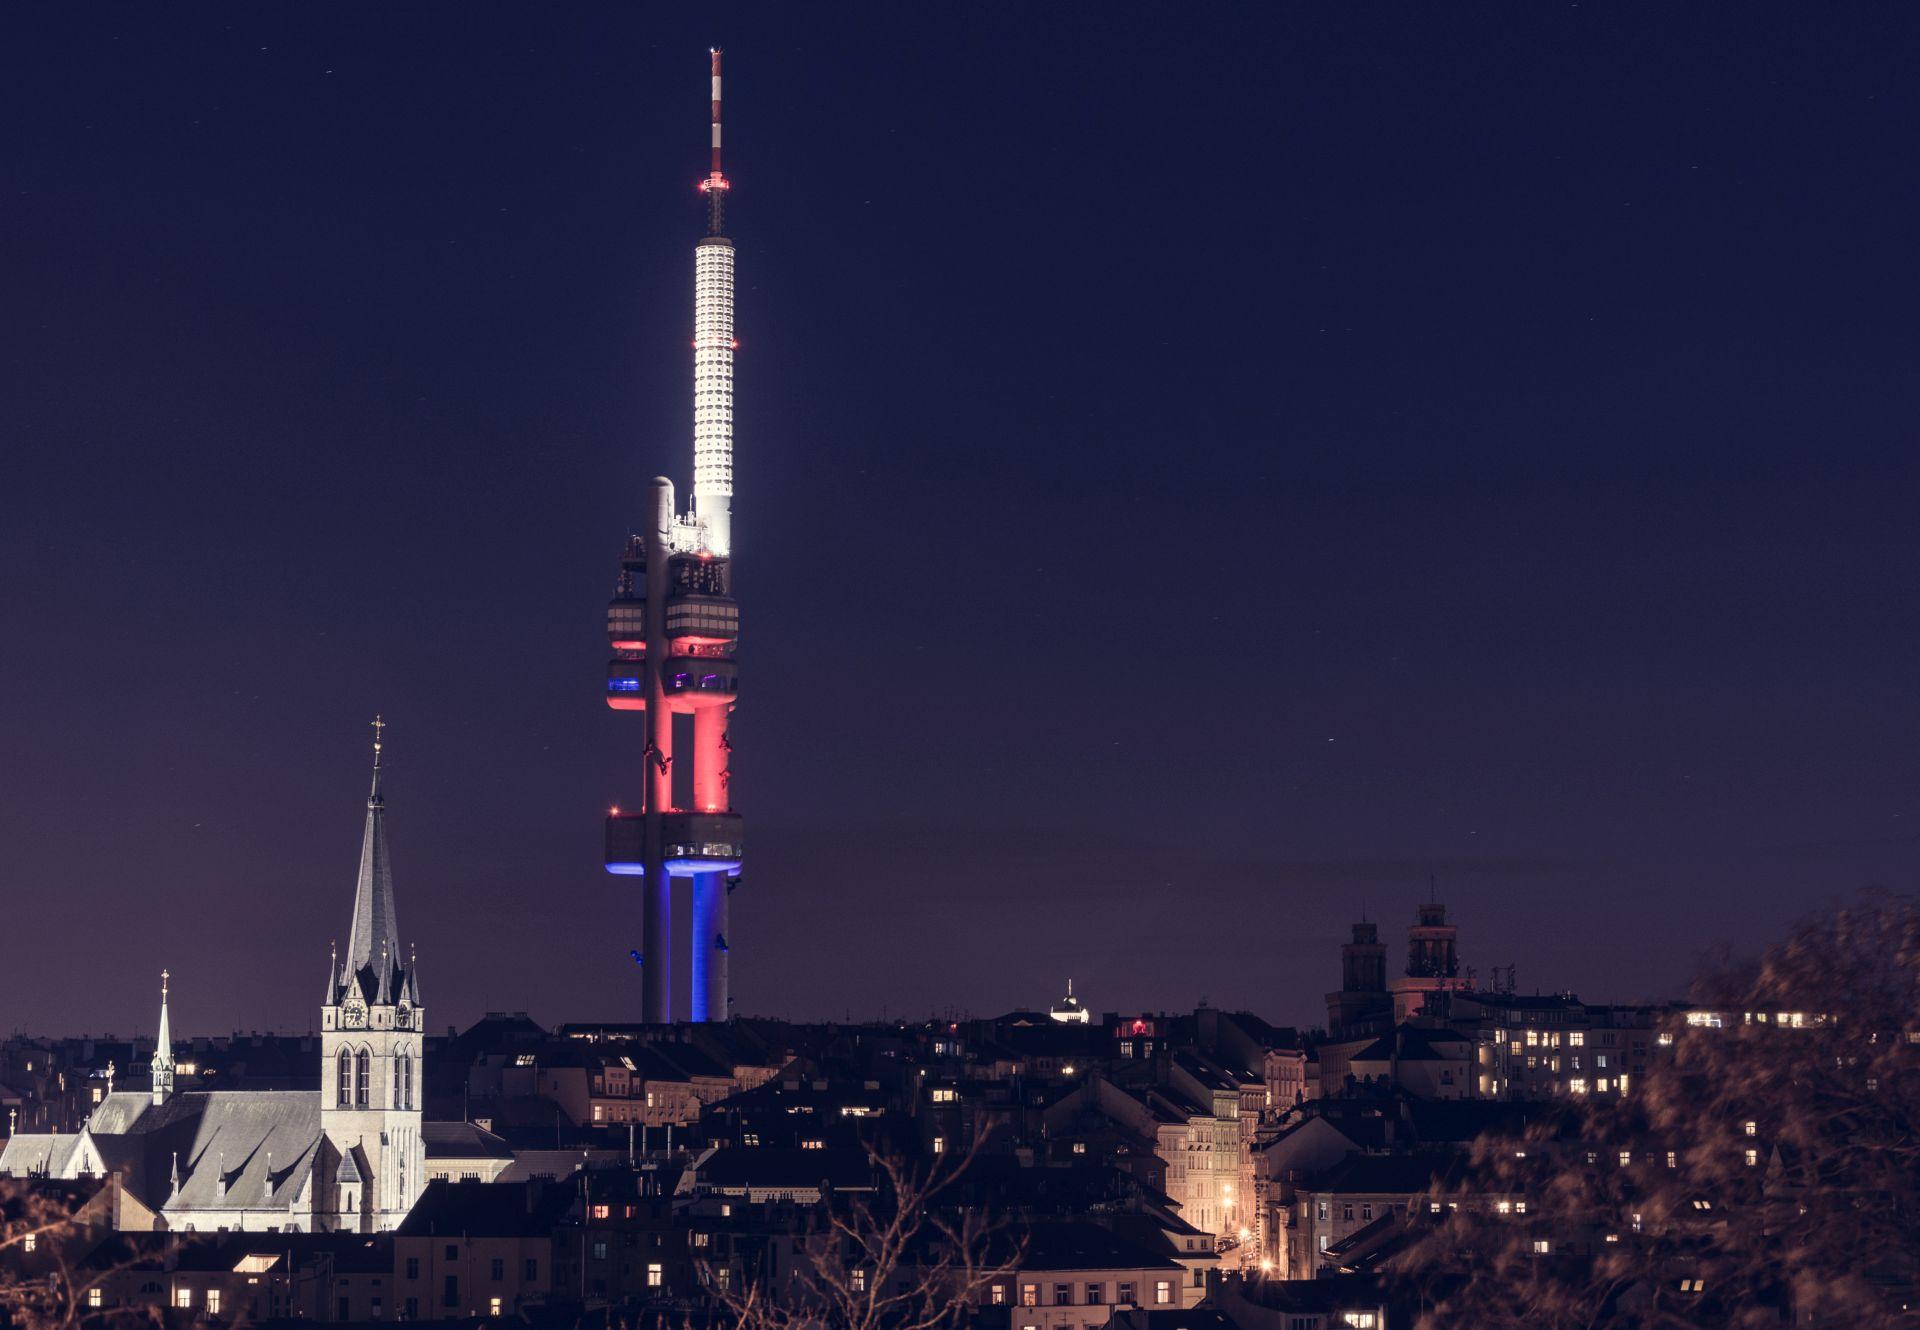 The Žižkov TV Tower in Prague seen from the Vitkov Hill, Czech Republic